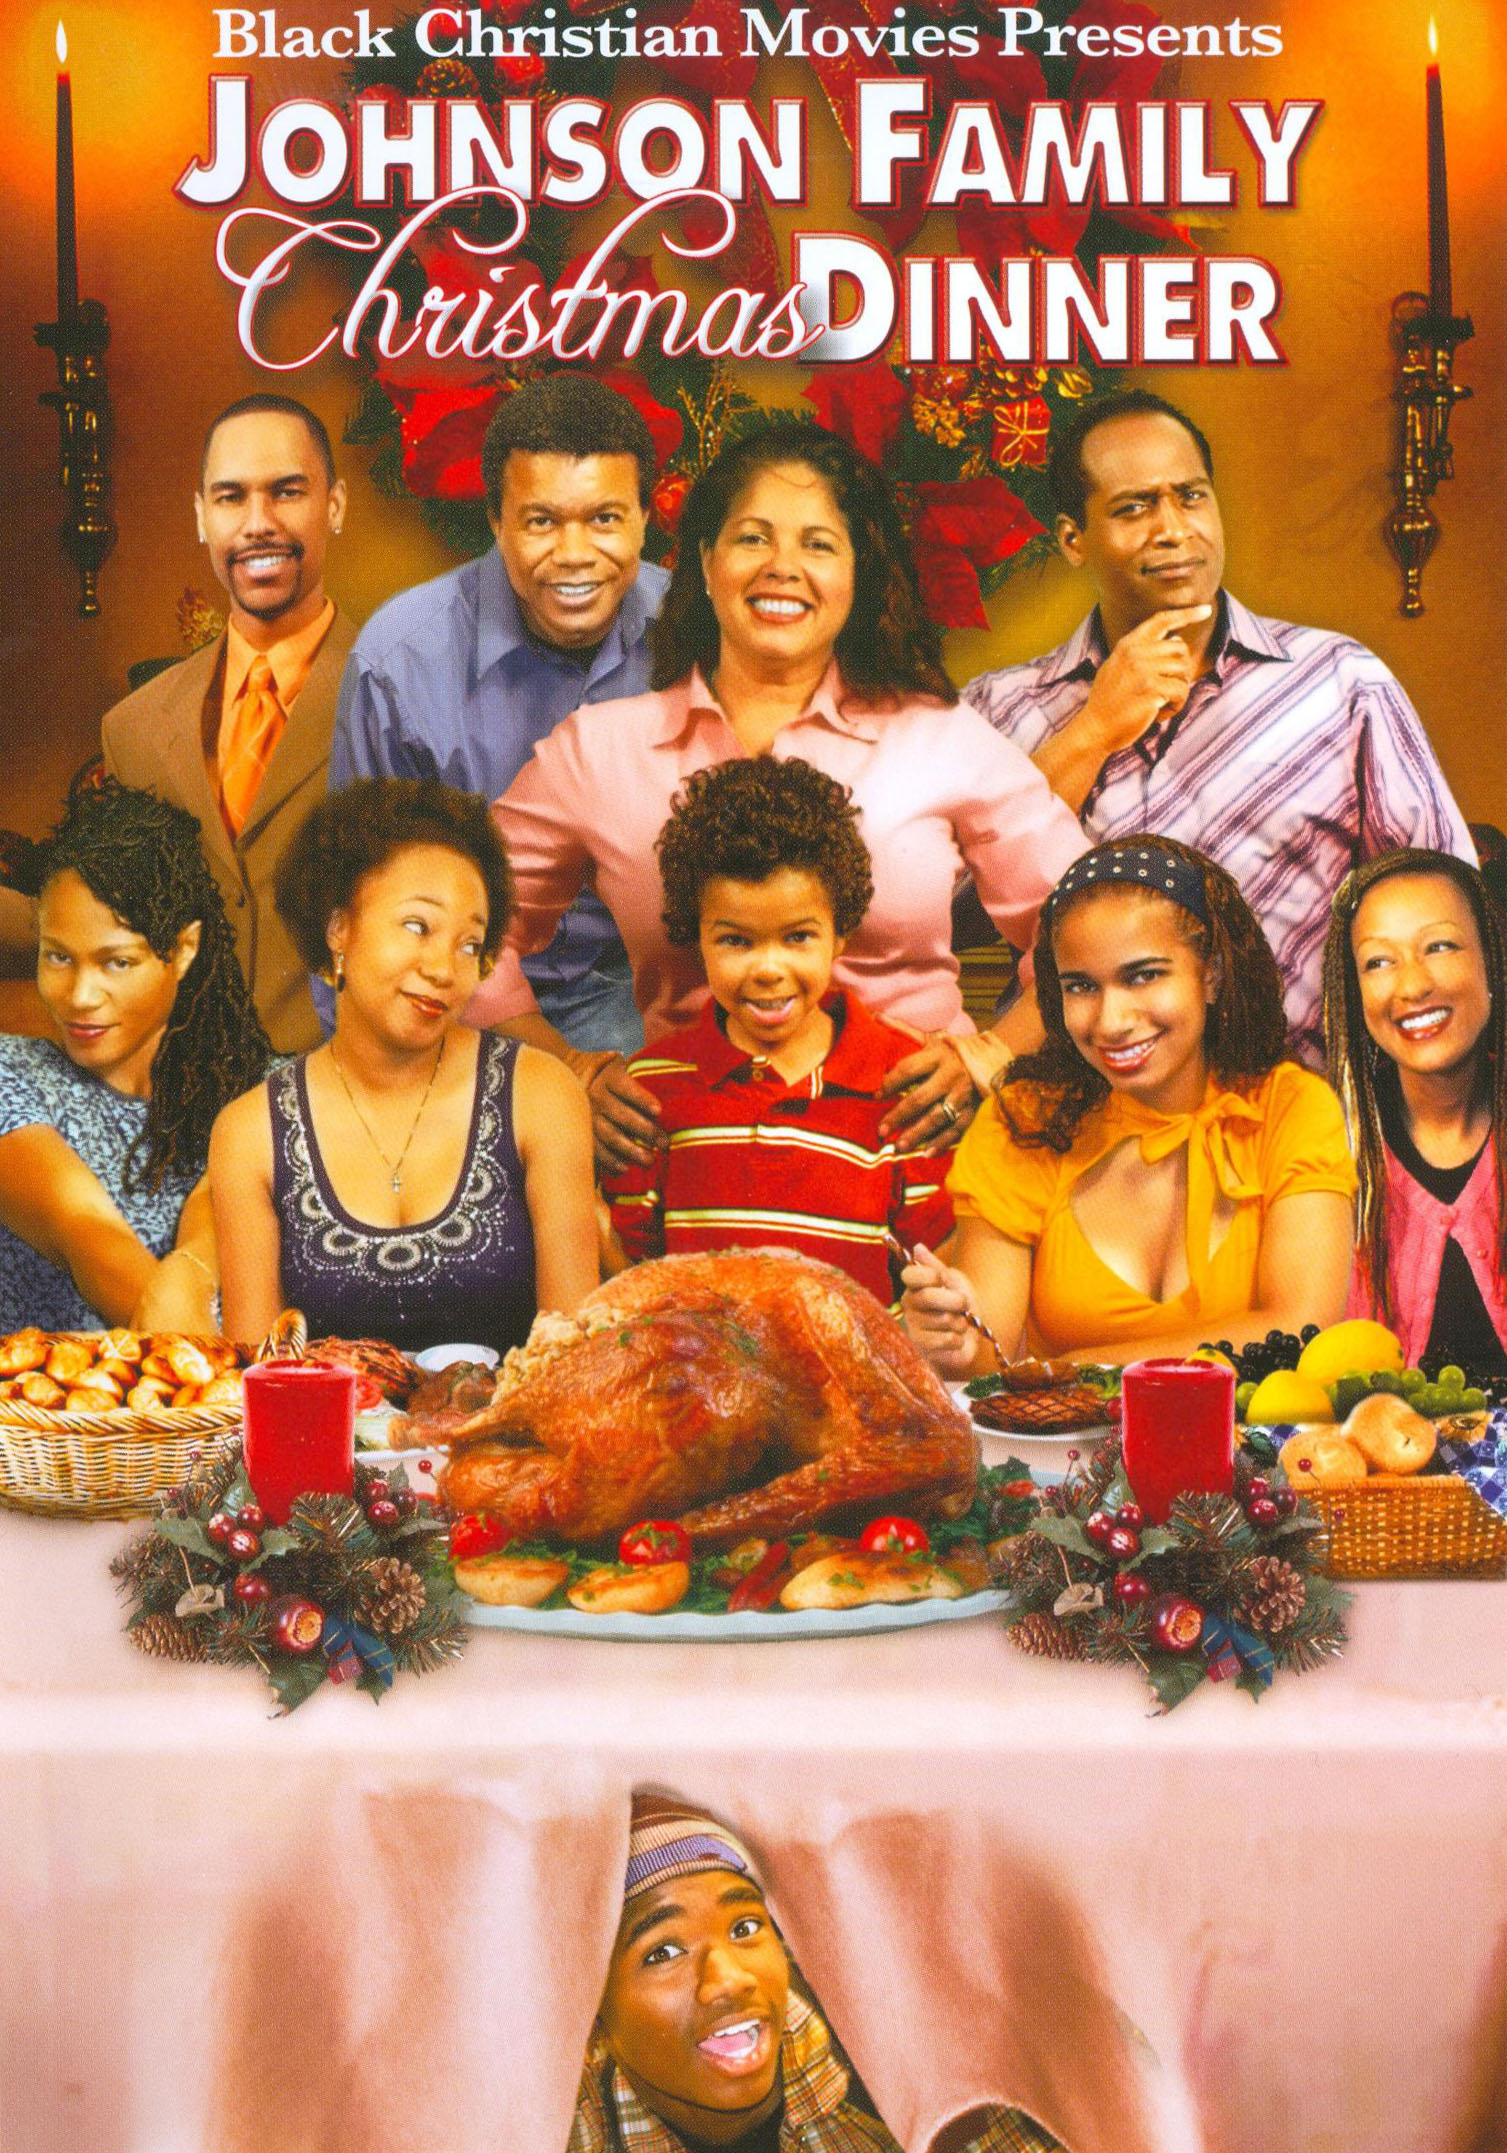 Johnson Family Christmas Dinner (2007) - Jamison Brandi   Synopsis ...